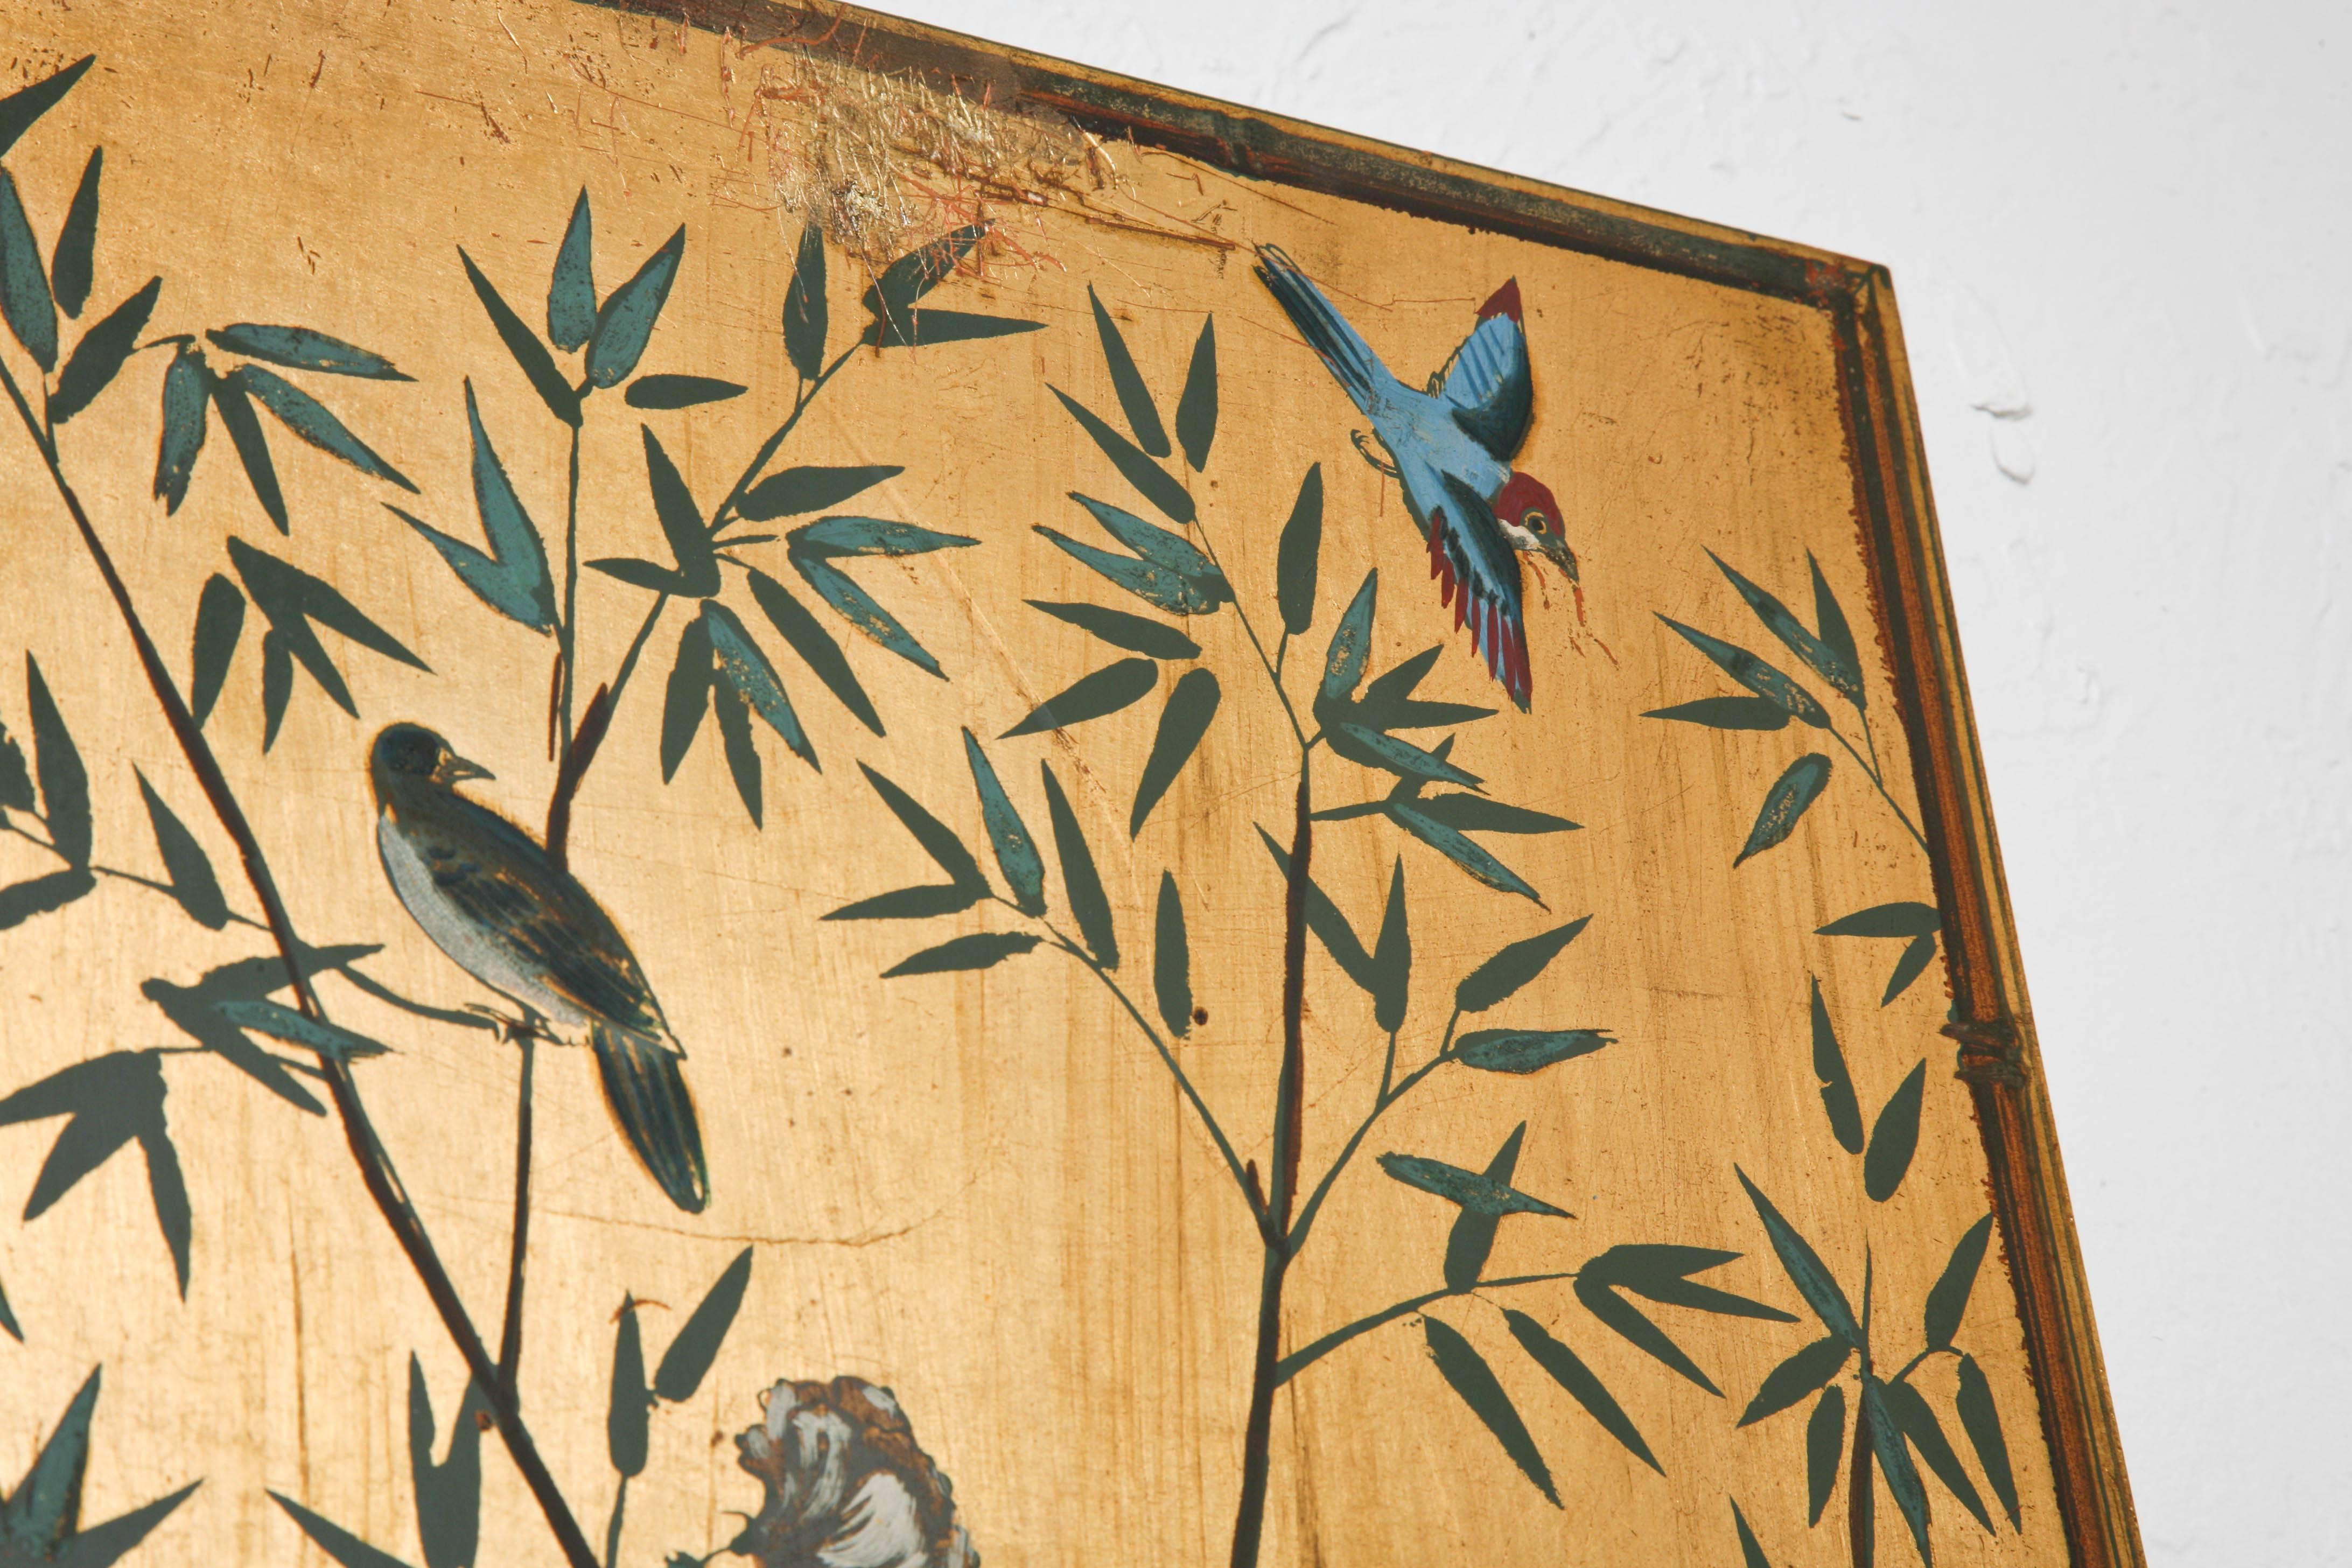 Set of Three Chinoiserie Wood Panels by Palladio at 1stdibs